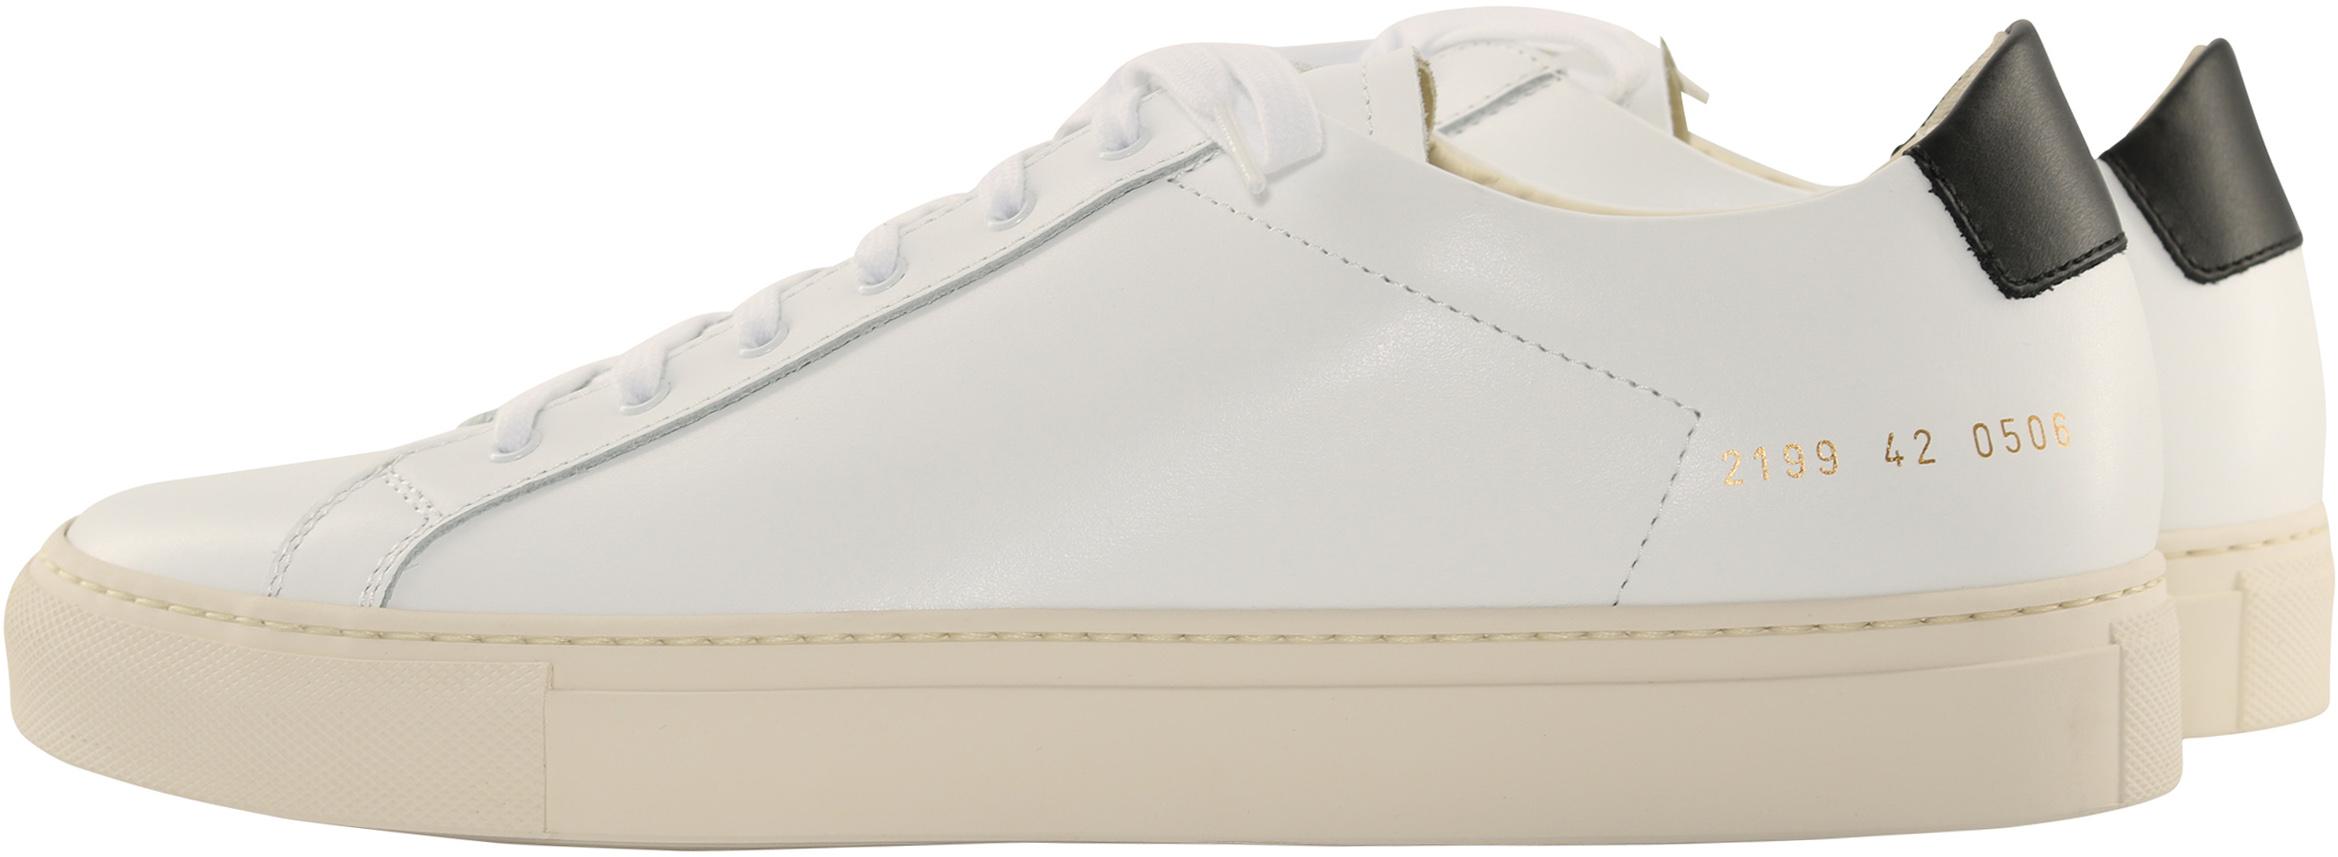 Common Projects Sneaker Retro White